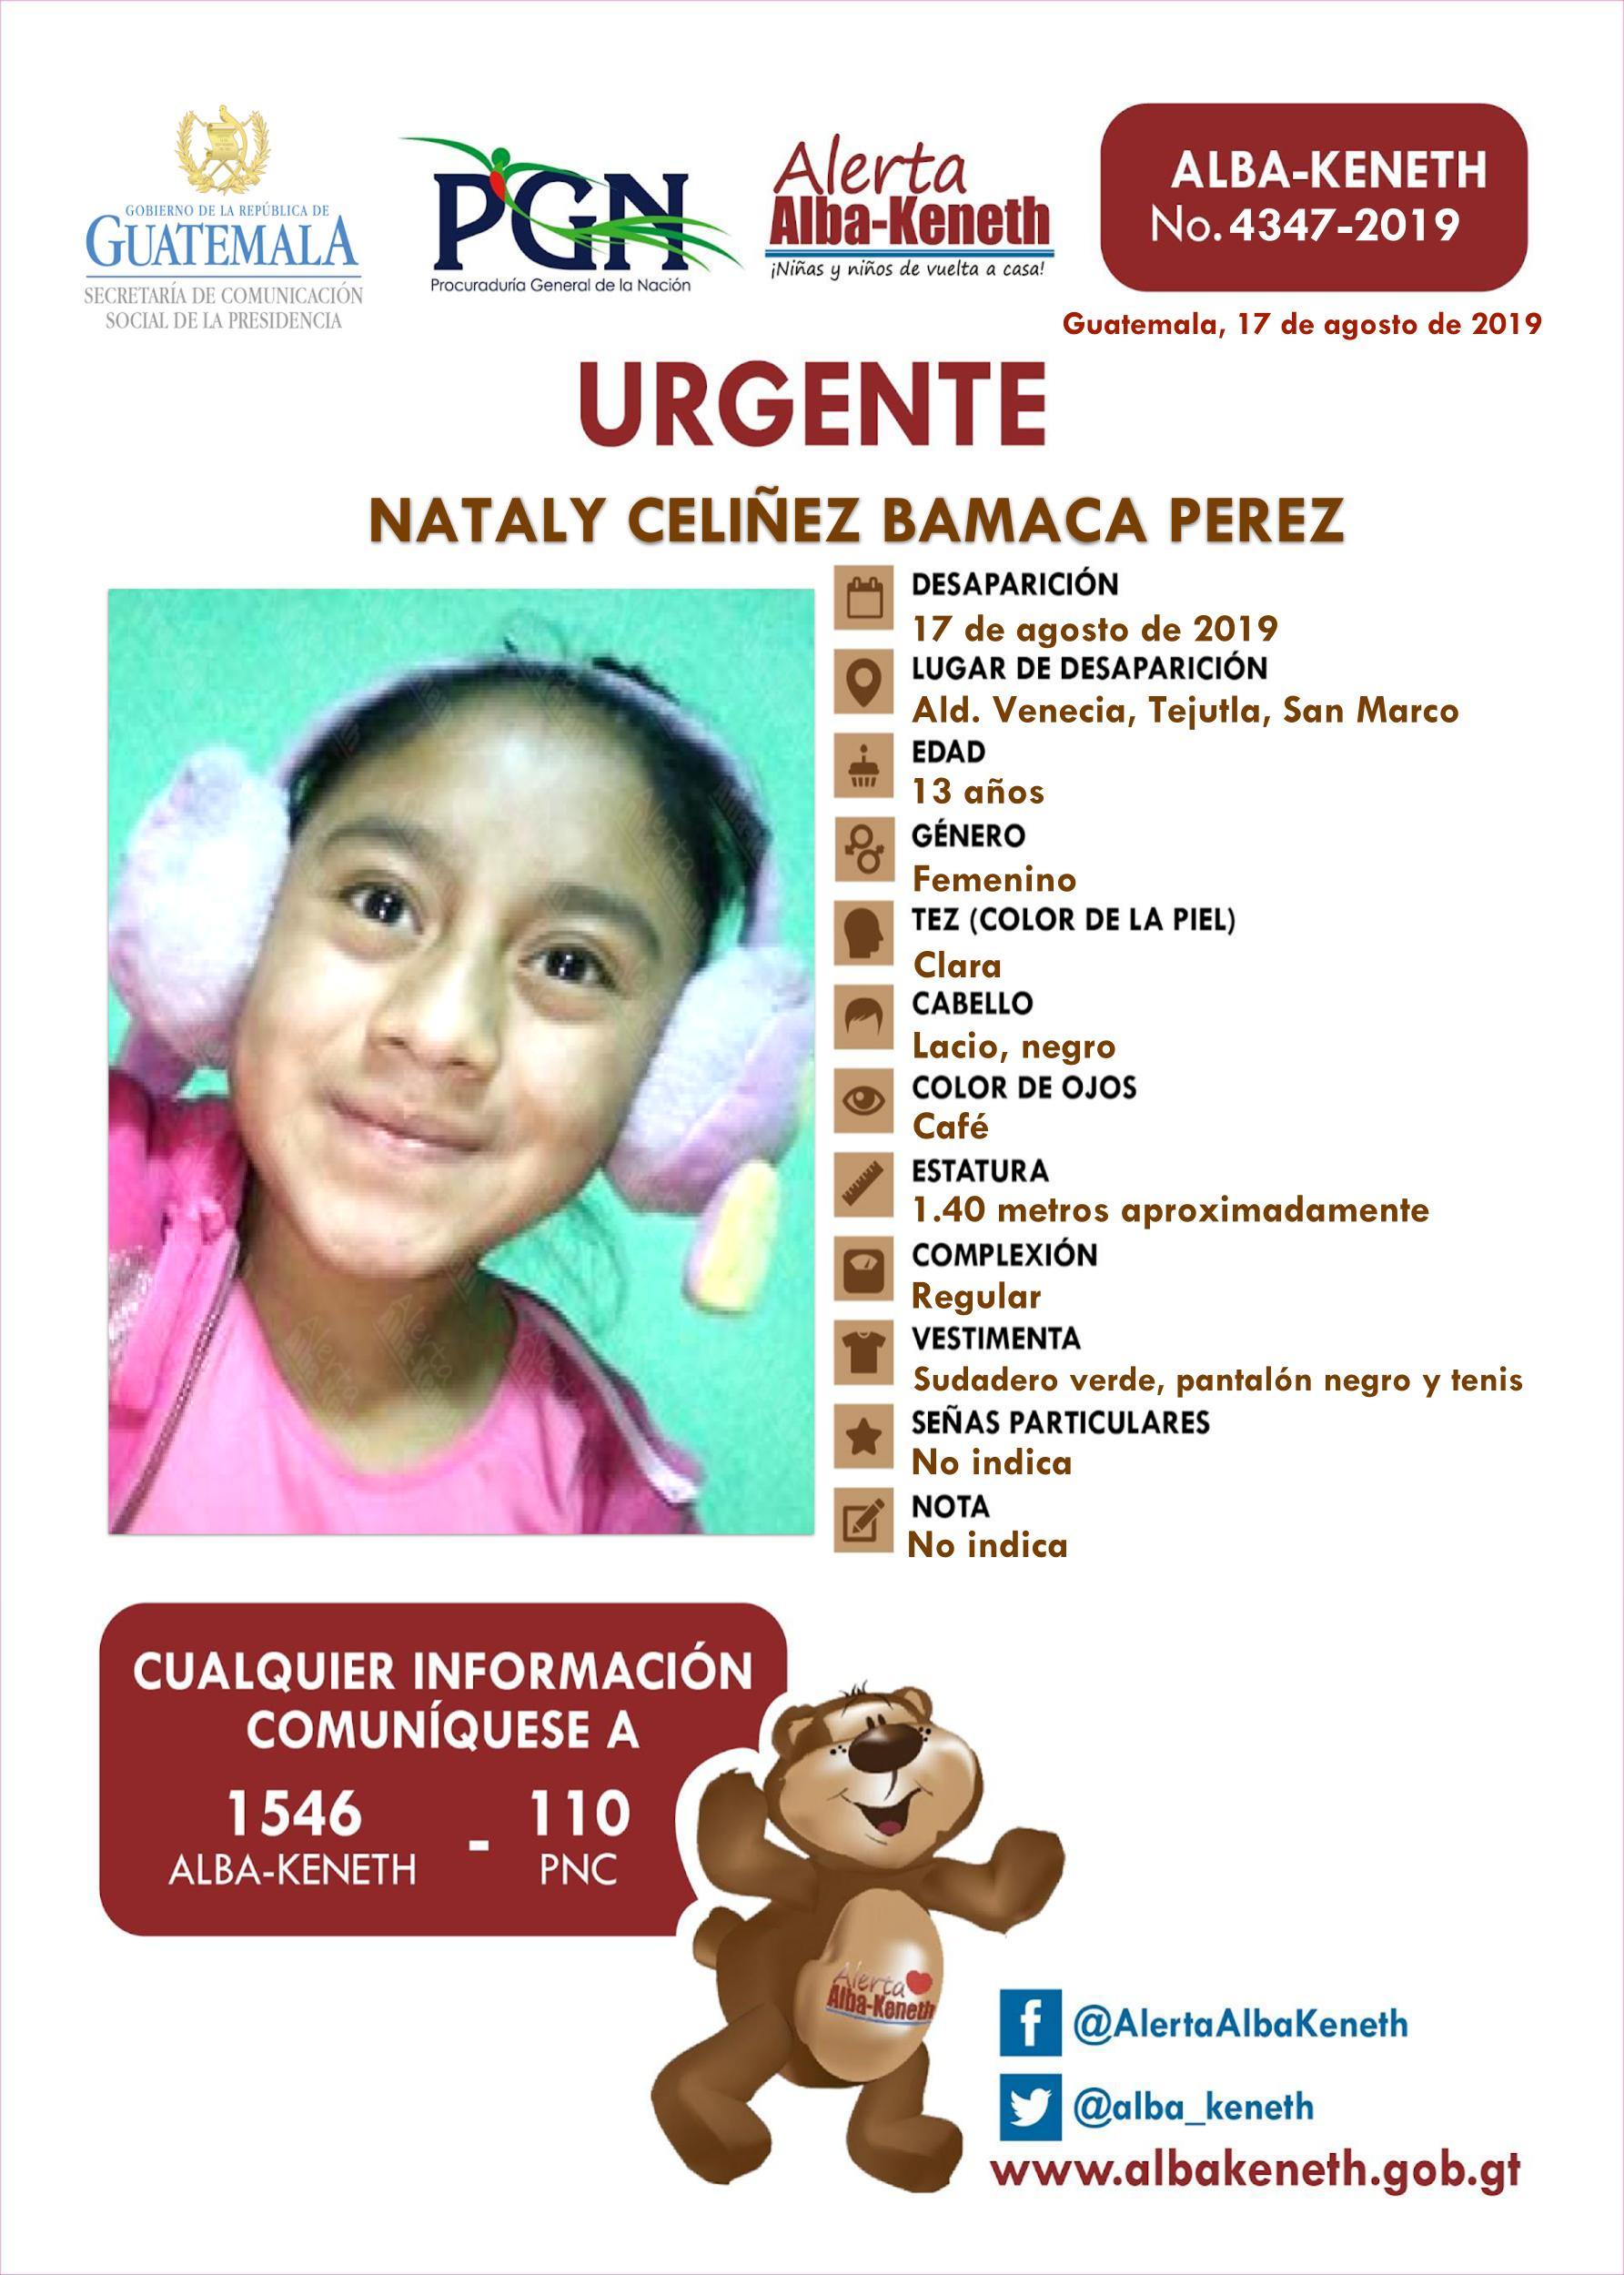 Nataly Celiñez Bamaca Perez